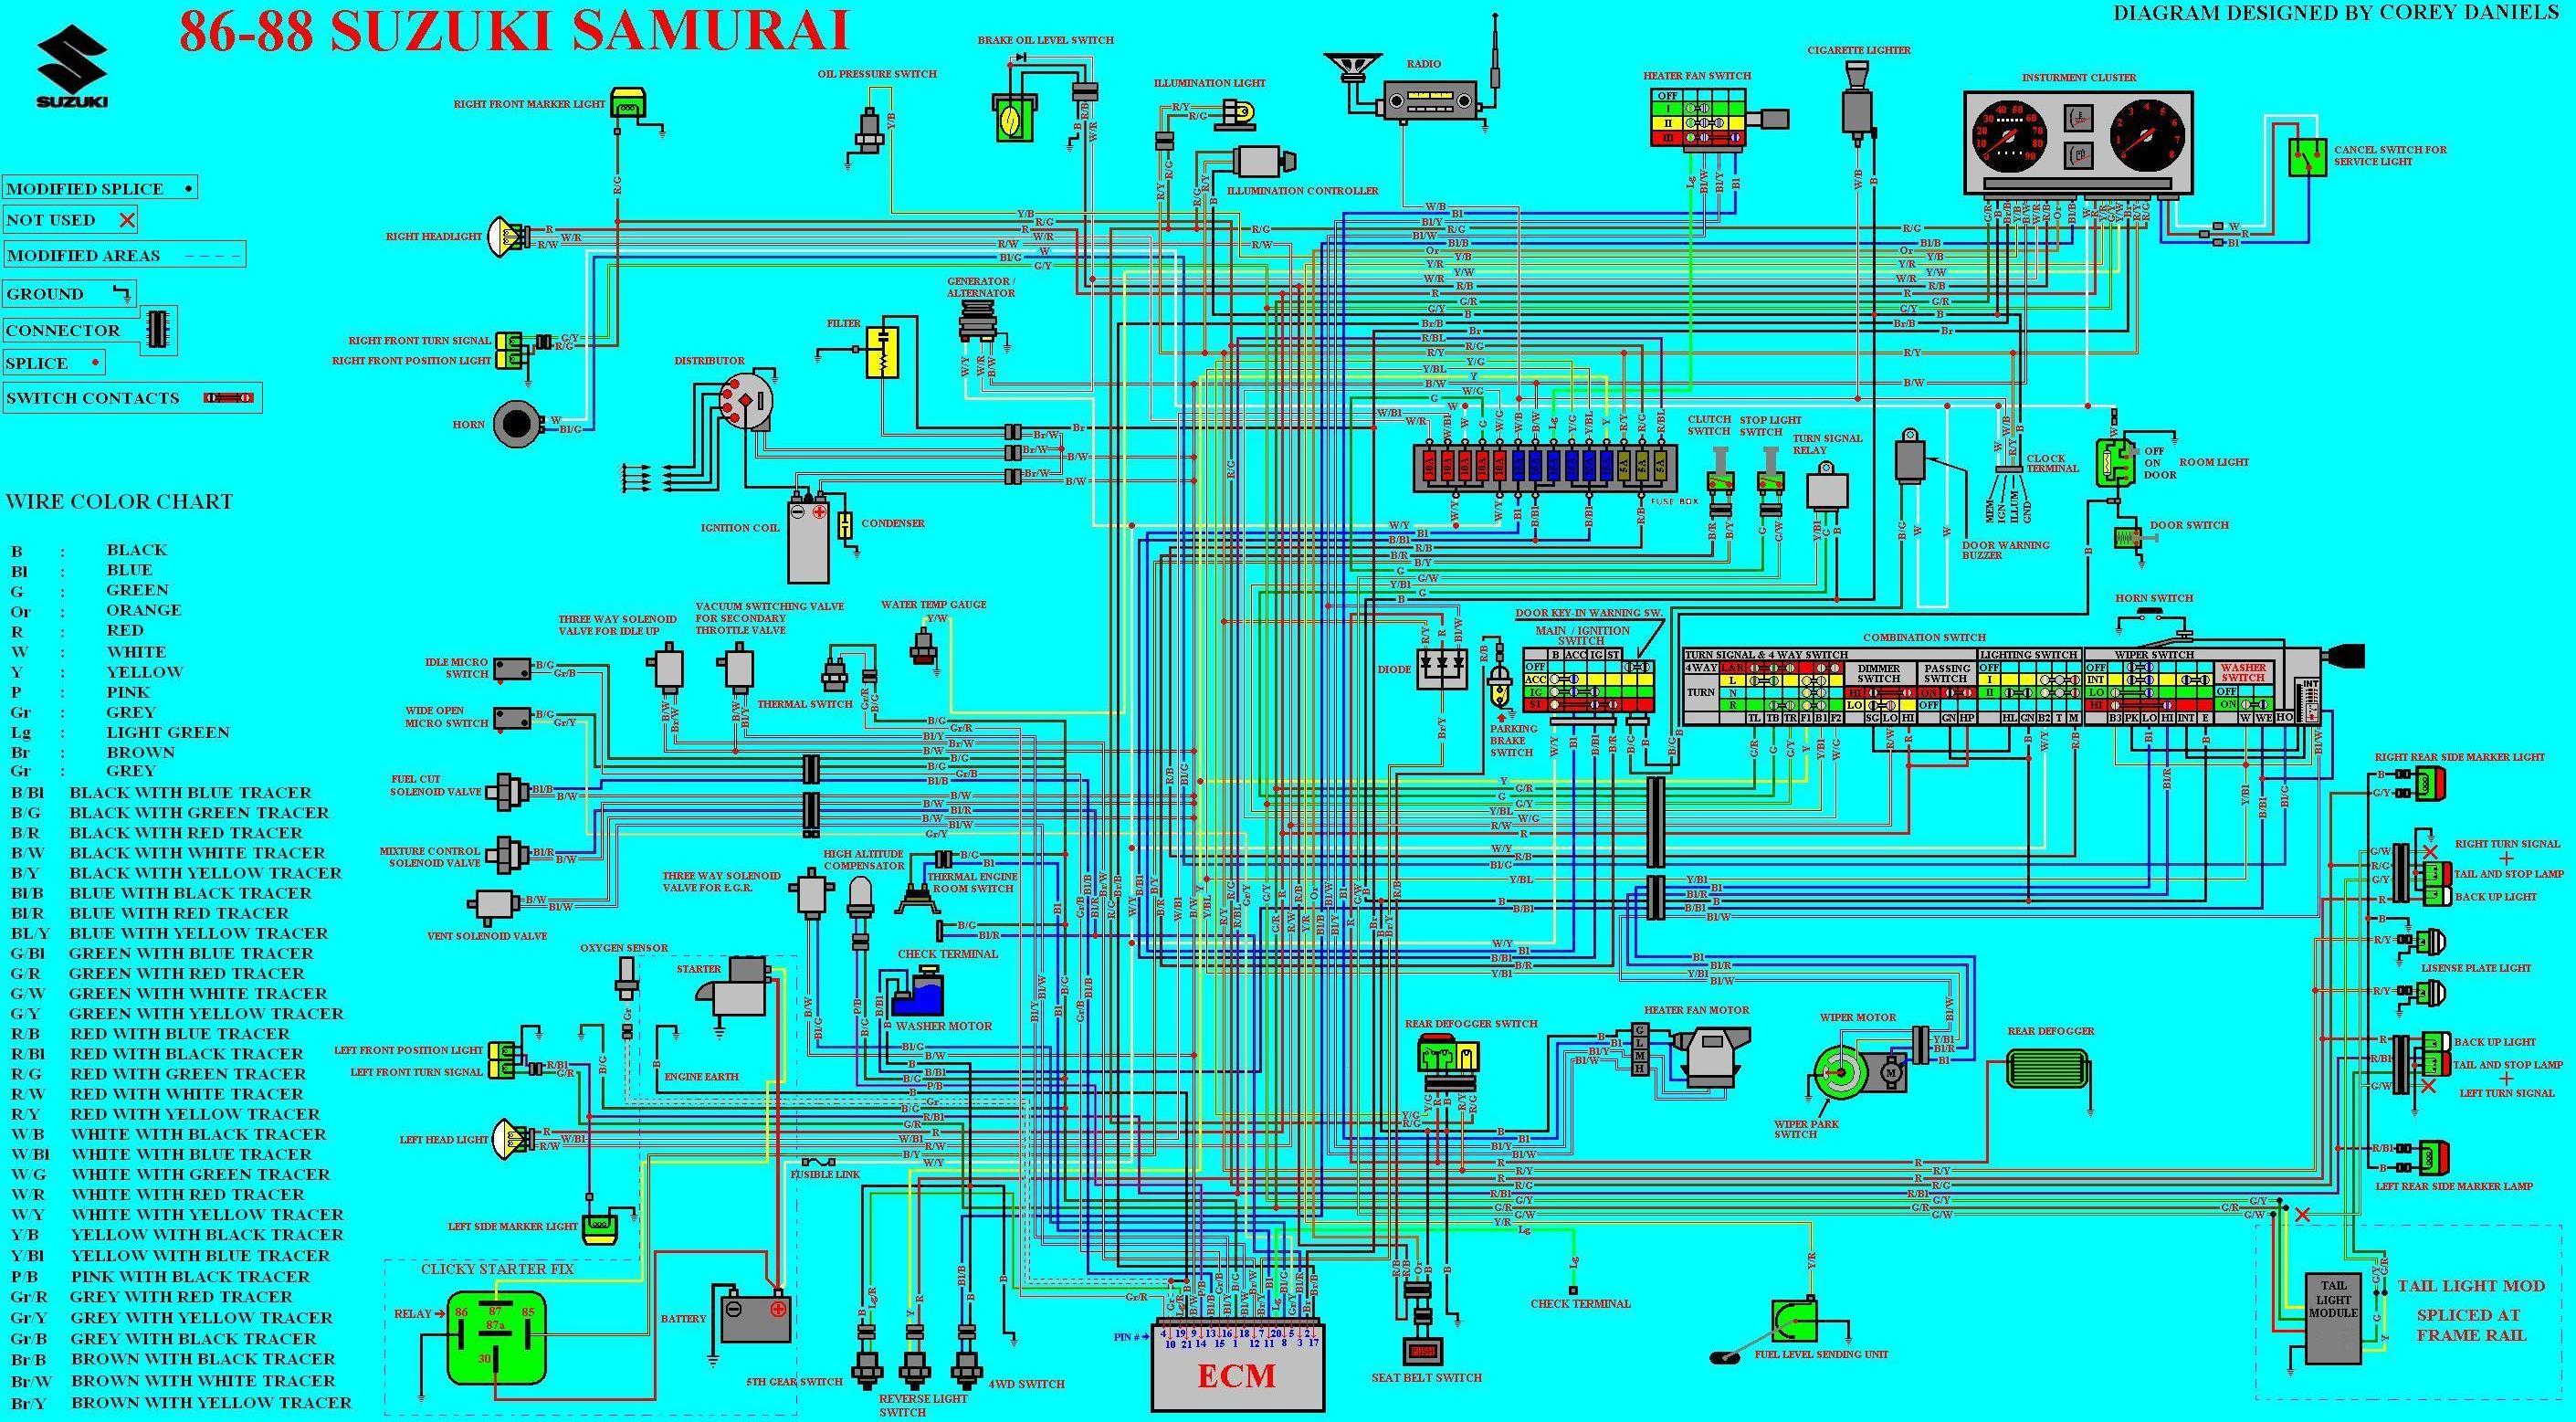 Miraculous Suzuki Sidekick Wiring Diagram Basic Electronics Wiring Diagram Wiring Cloud Ymoonsalvmohammedshrineorg